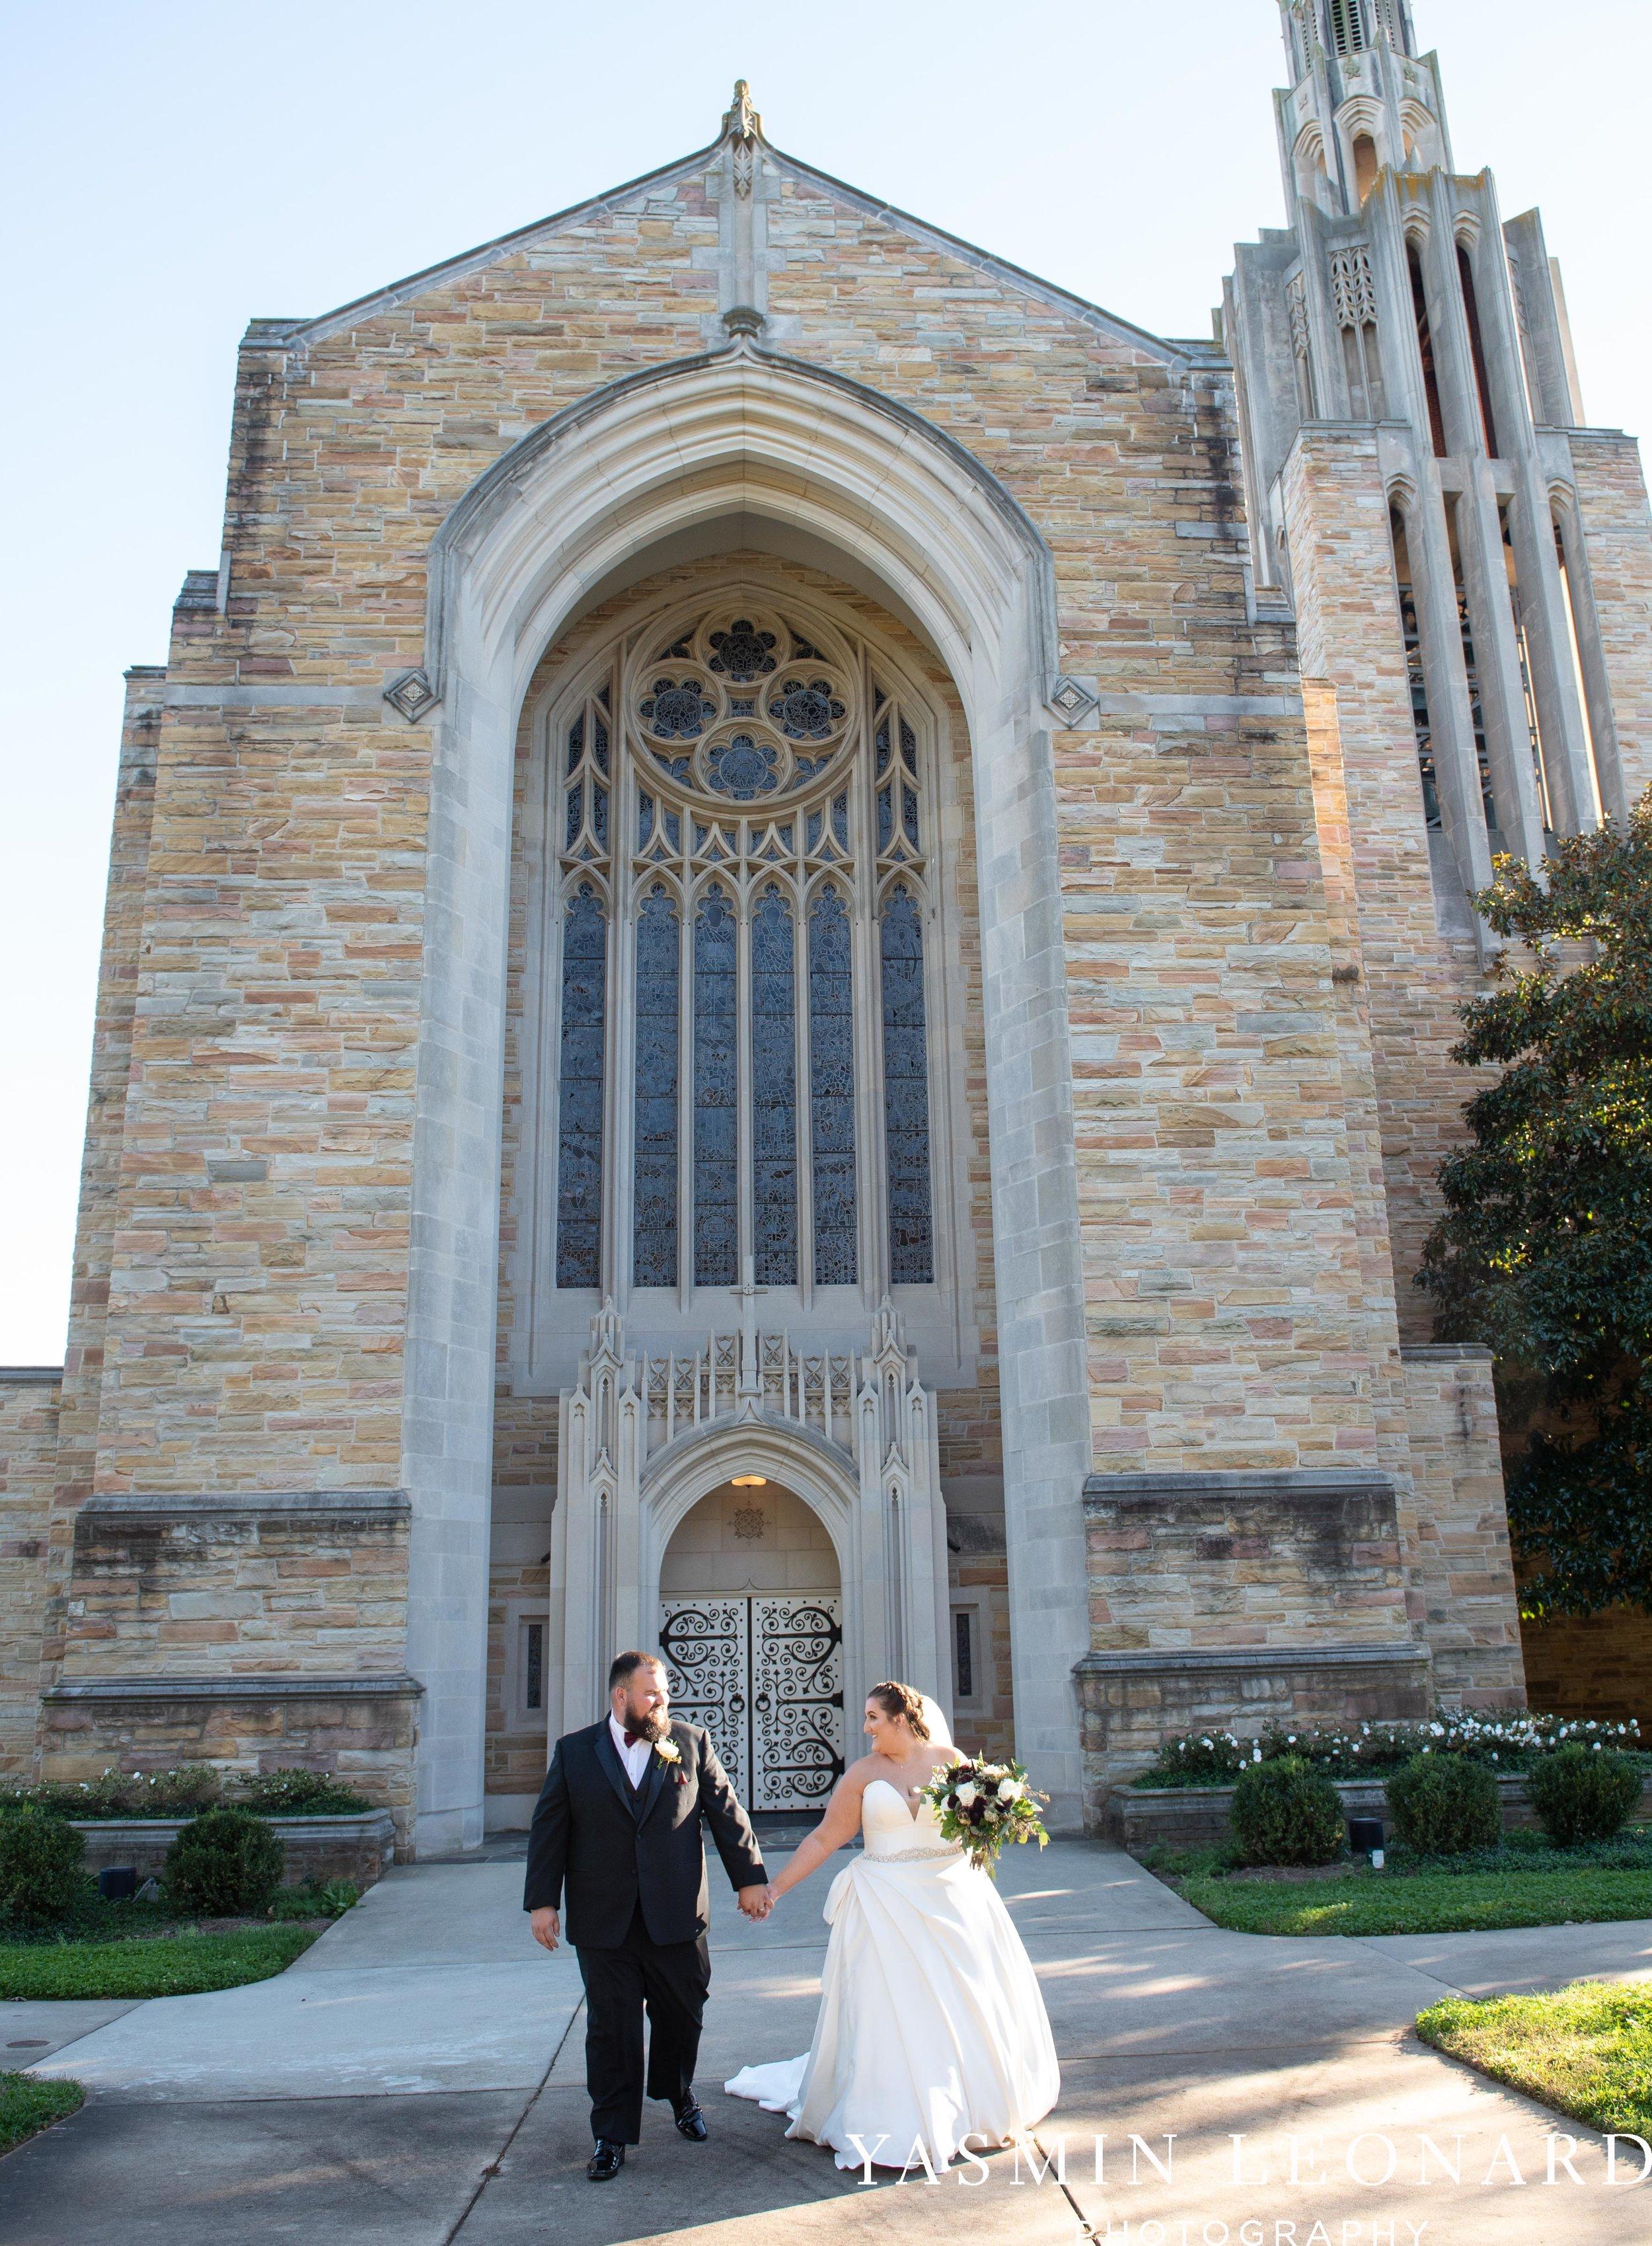 Wesley Memorial United Methodist Church - Old Homeplace Winery - High Point Weddings - High Point Wedding Photographer - NC Weddings - NC Barn Venue - Yasmin Leonard Photography-30.jpg